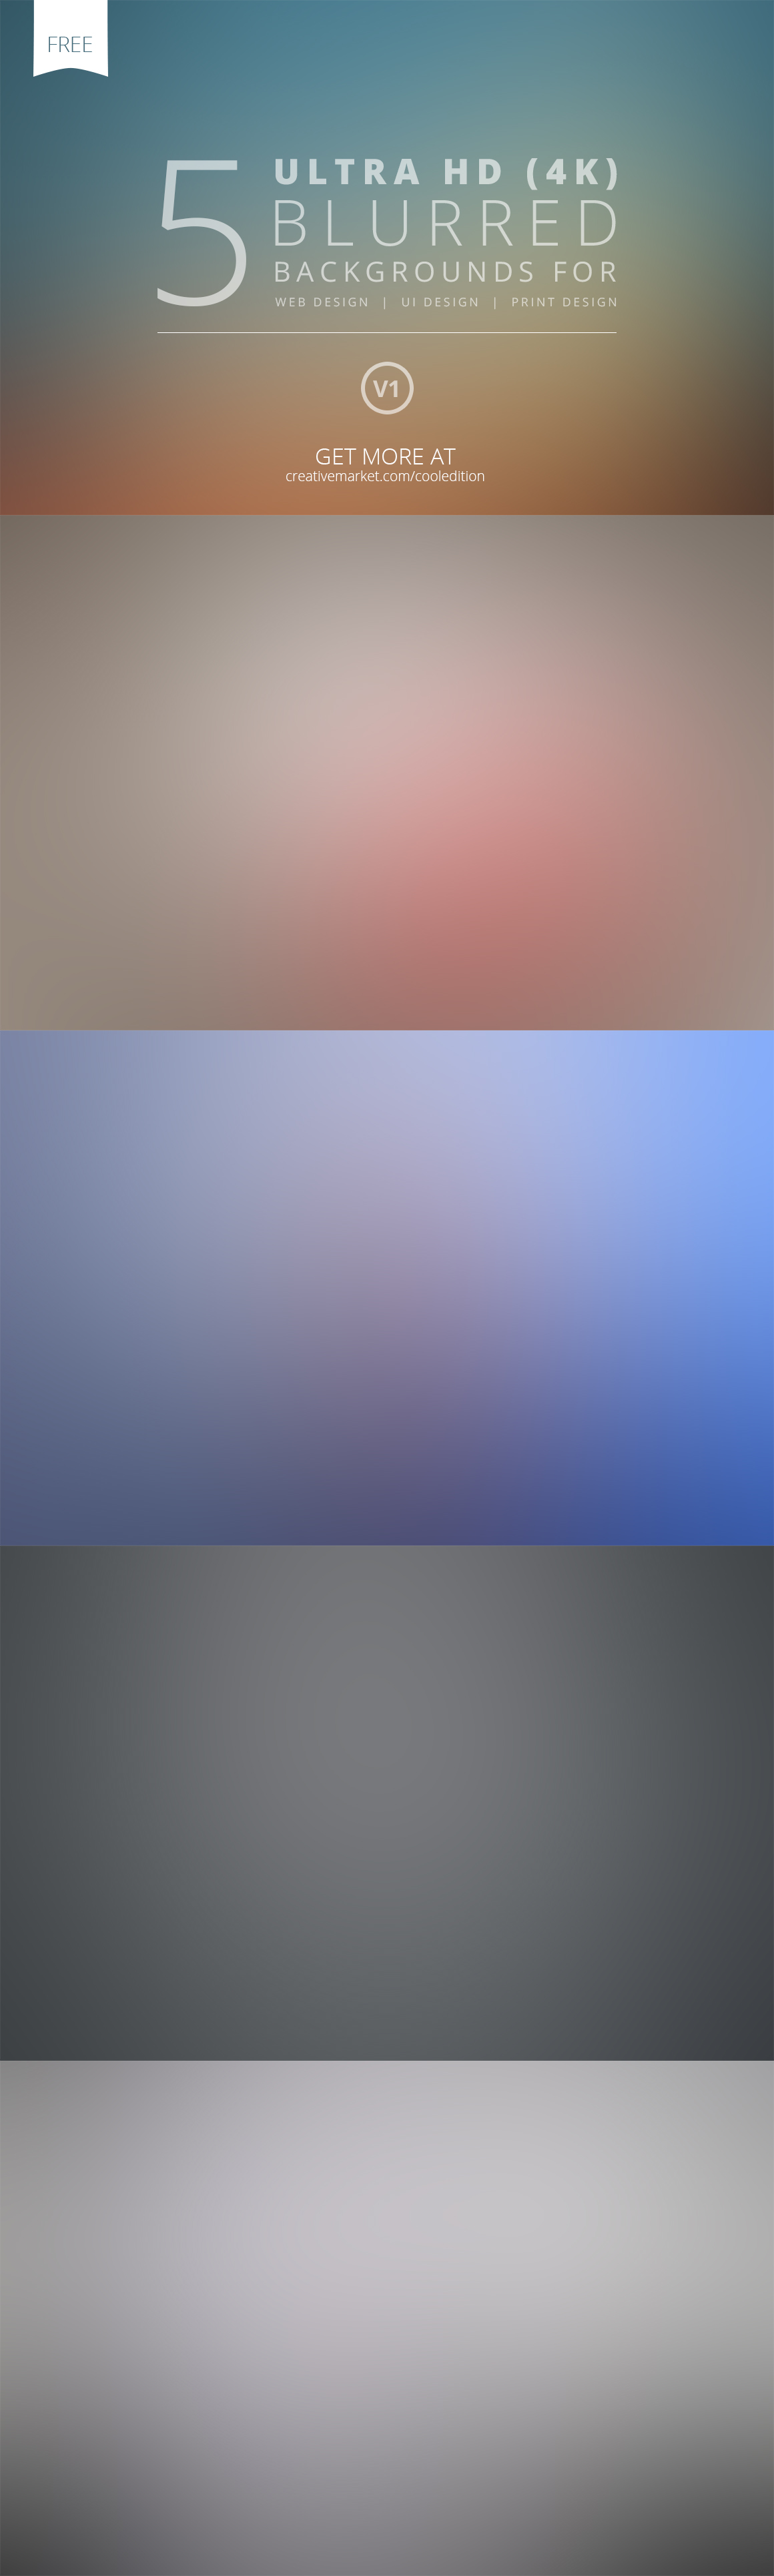 FREE - 5 Ultra HD Blurred Backgrounds v1